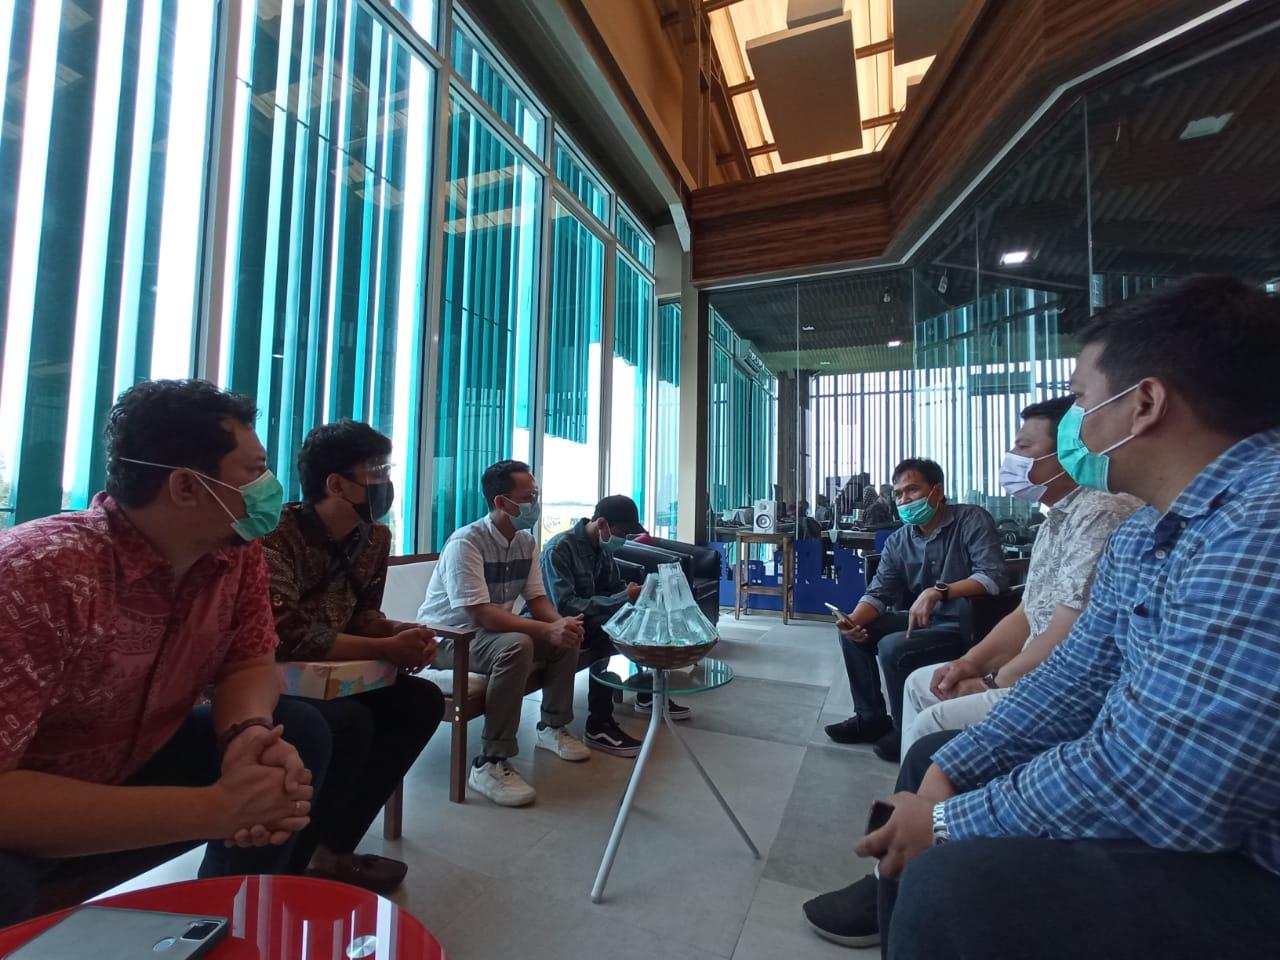 Suasana sharing dan silaturahmi bersama di Media Center Suara Surabaya Eddy Prasetyo. (Foto: Dimas Ari/Tugu Jatim)